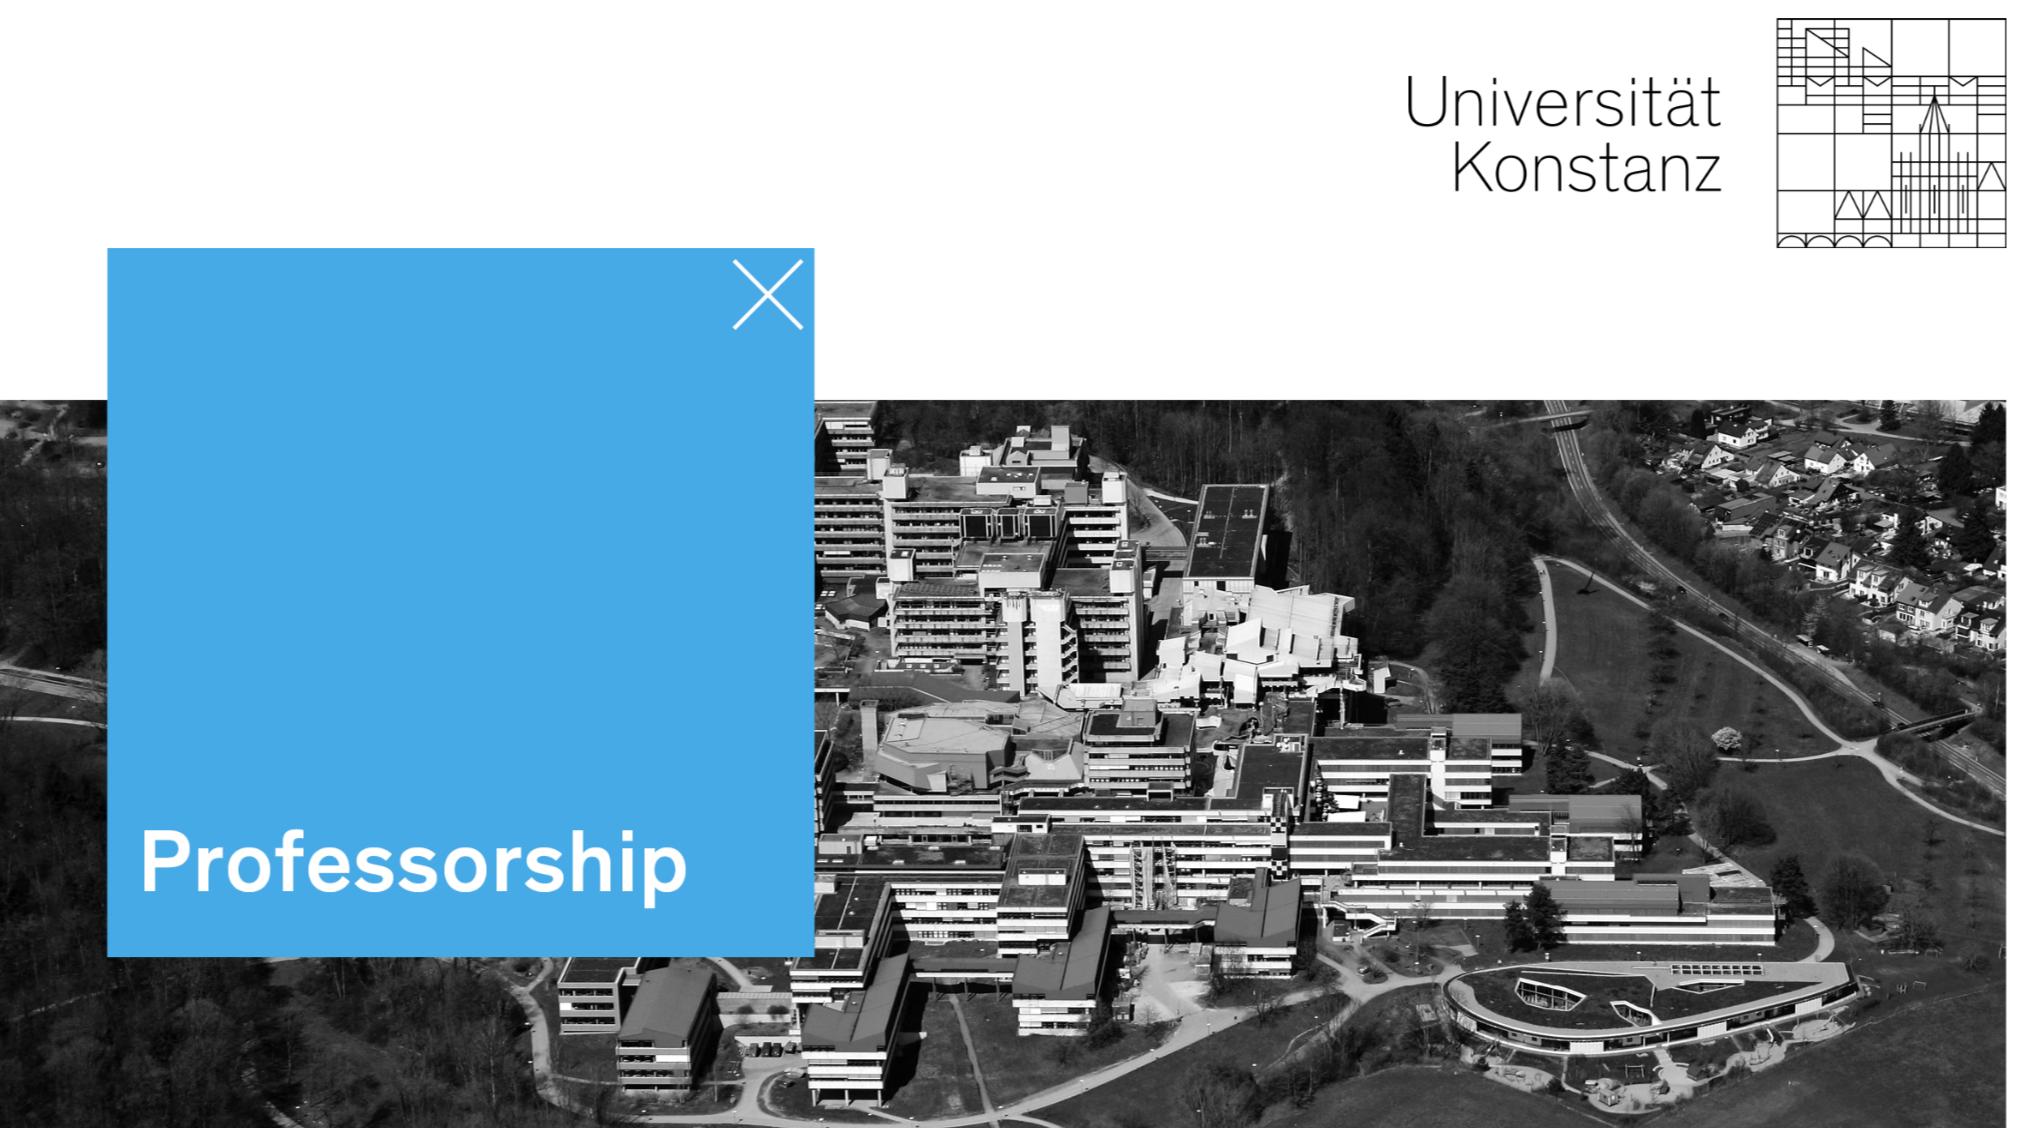 professorship photo Konstanz 2021